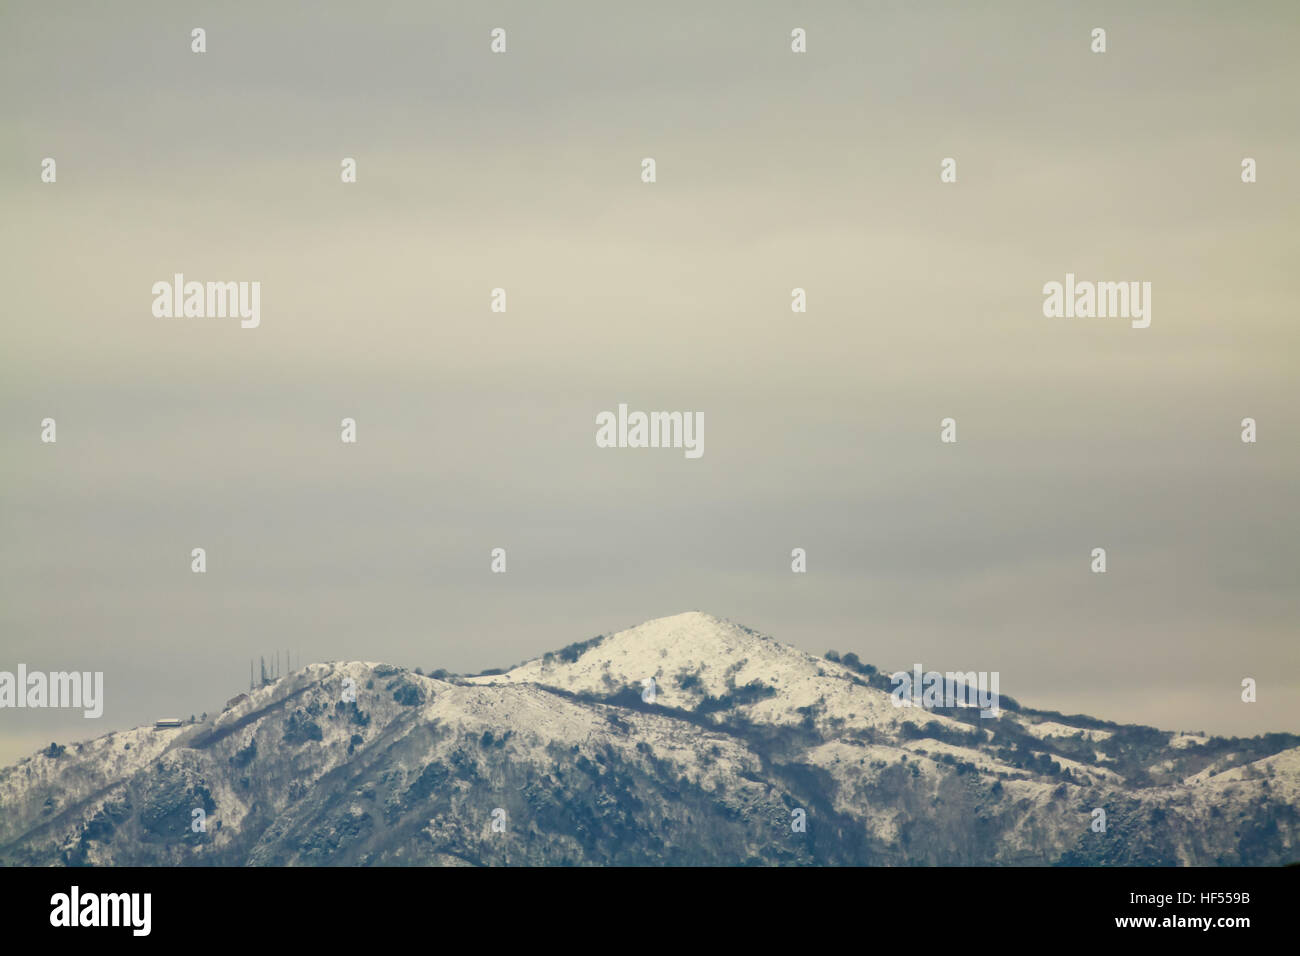 Snowy mountain top with dark sky - Stock Image